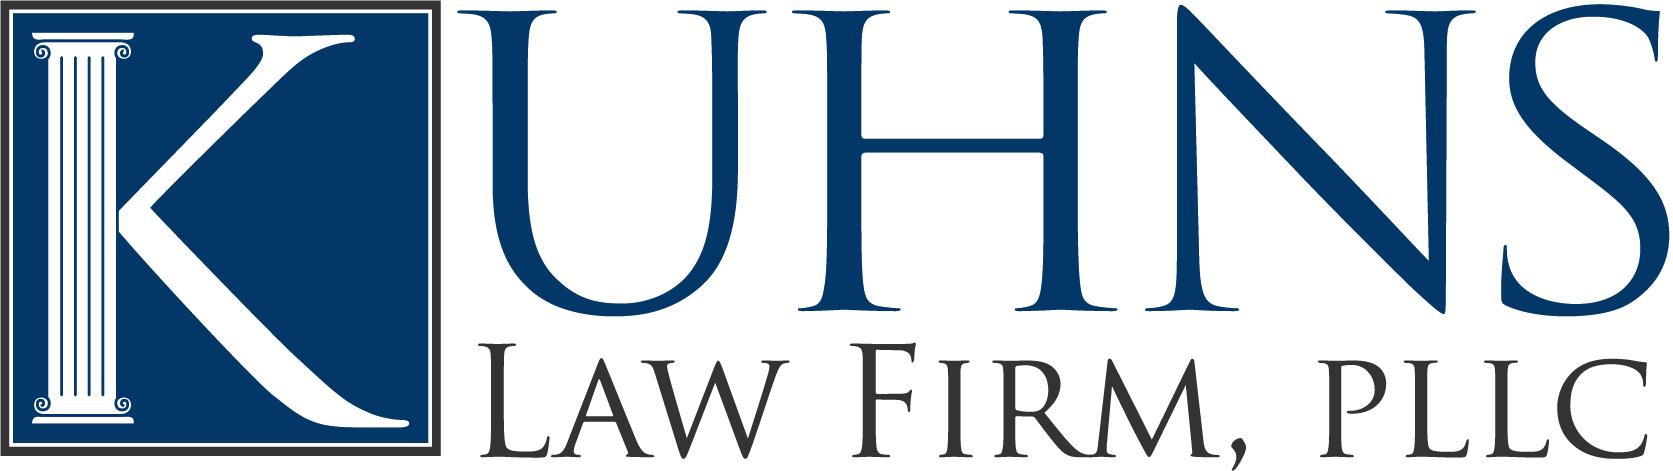 Kuhns Law Logo CMYK.jpg